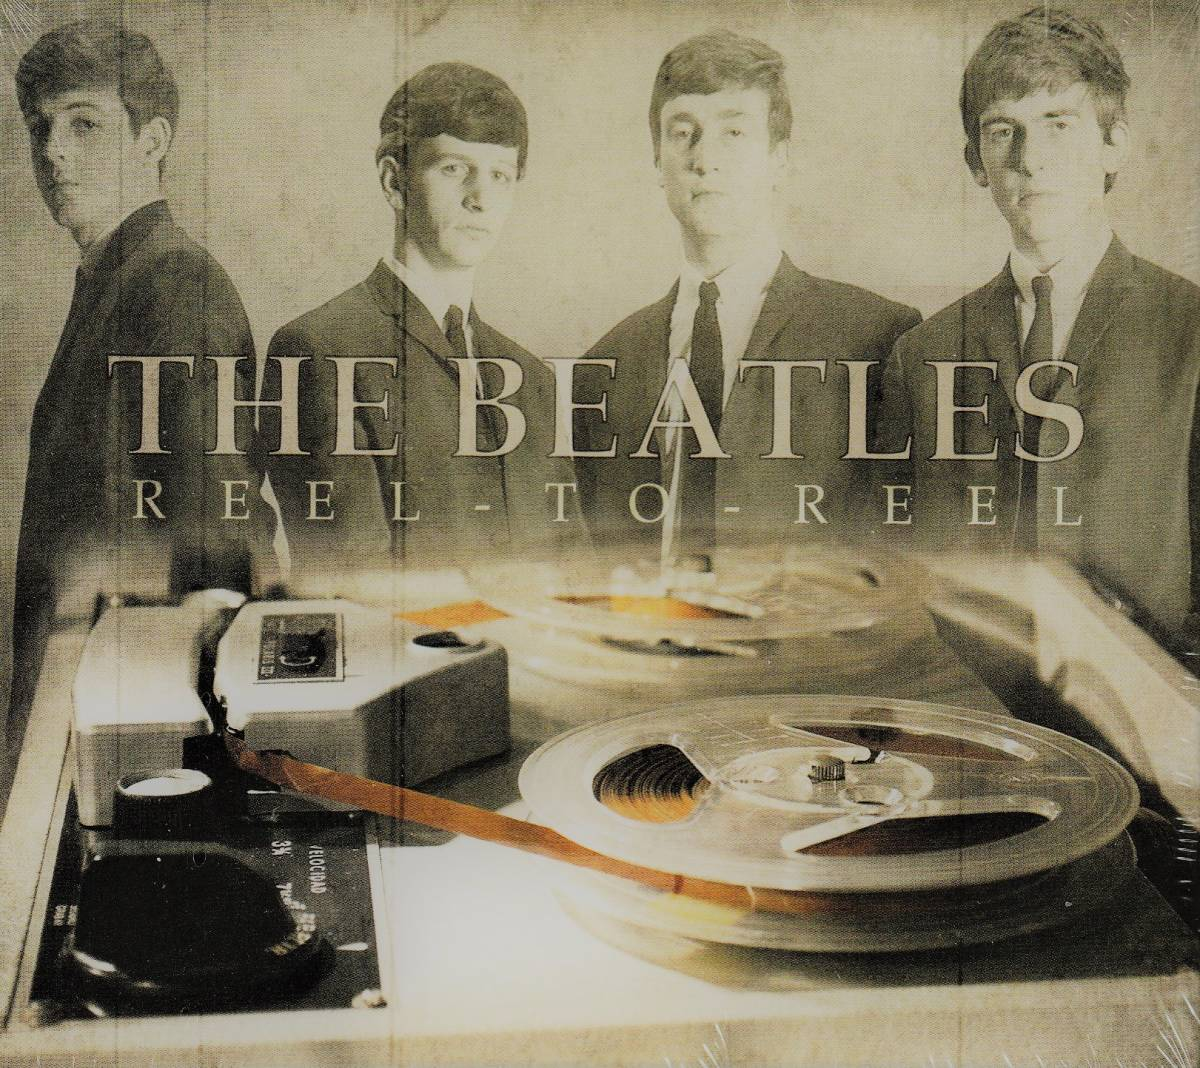 The Beatles: Tony Sheridan & The Beat Brothers: Reel To Reel